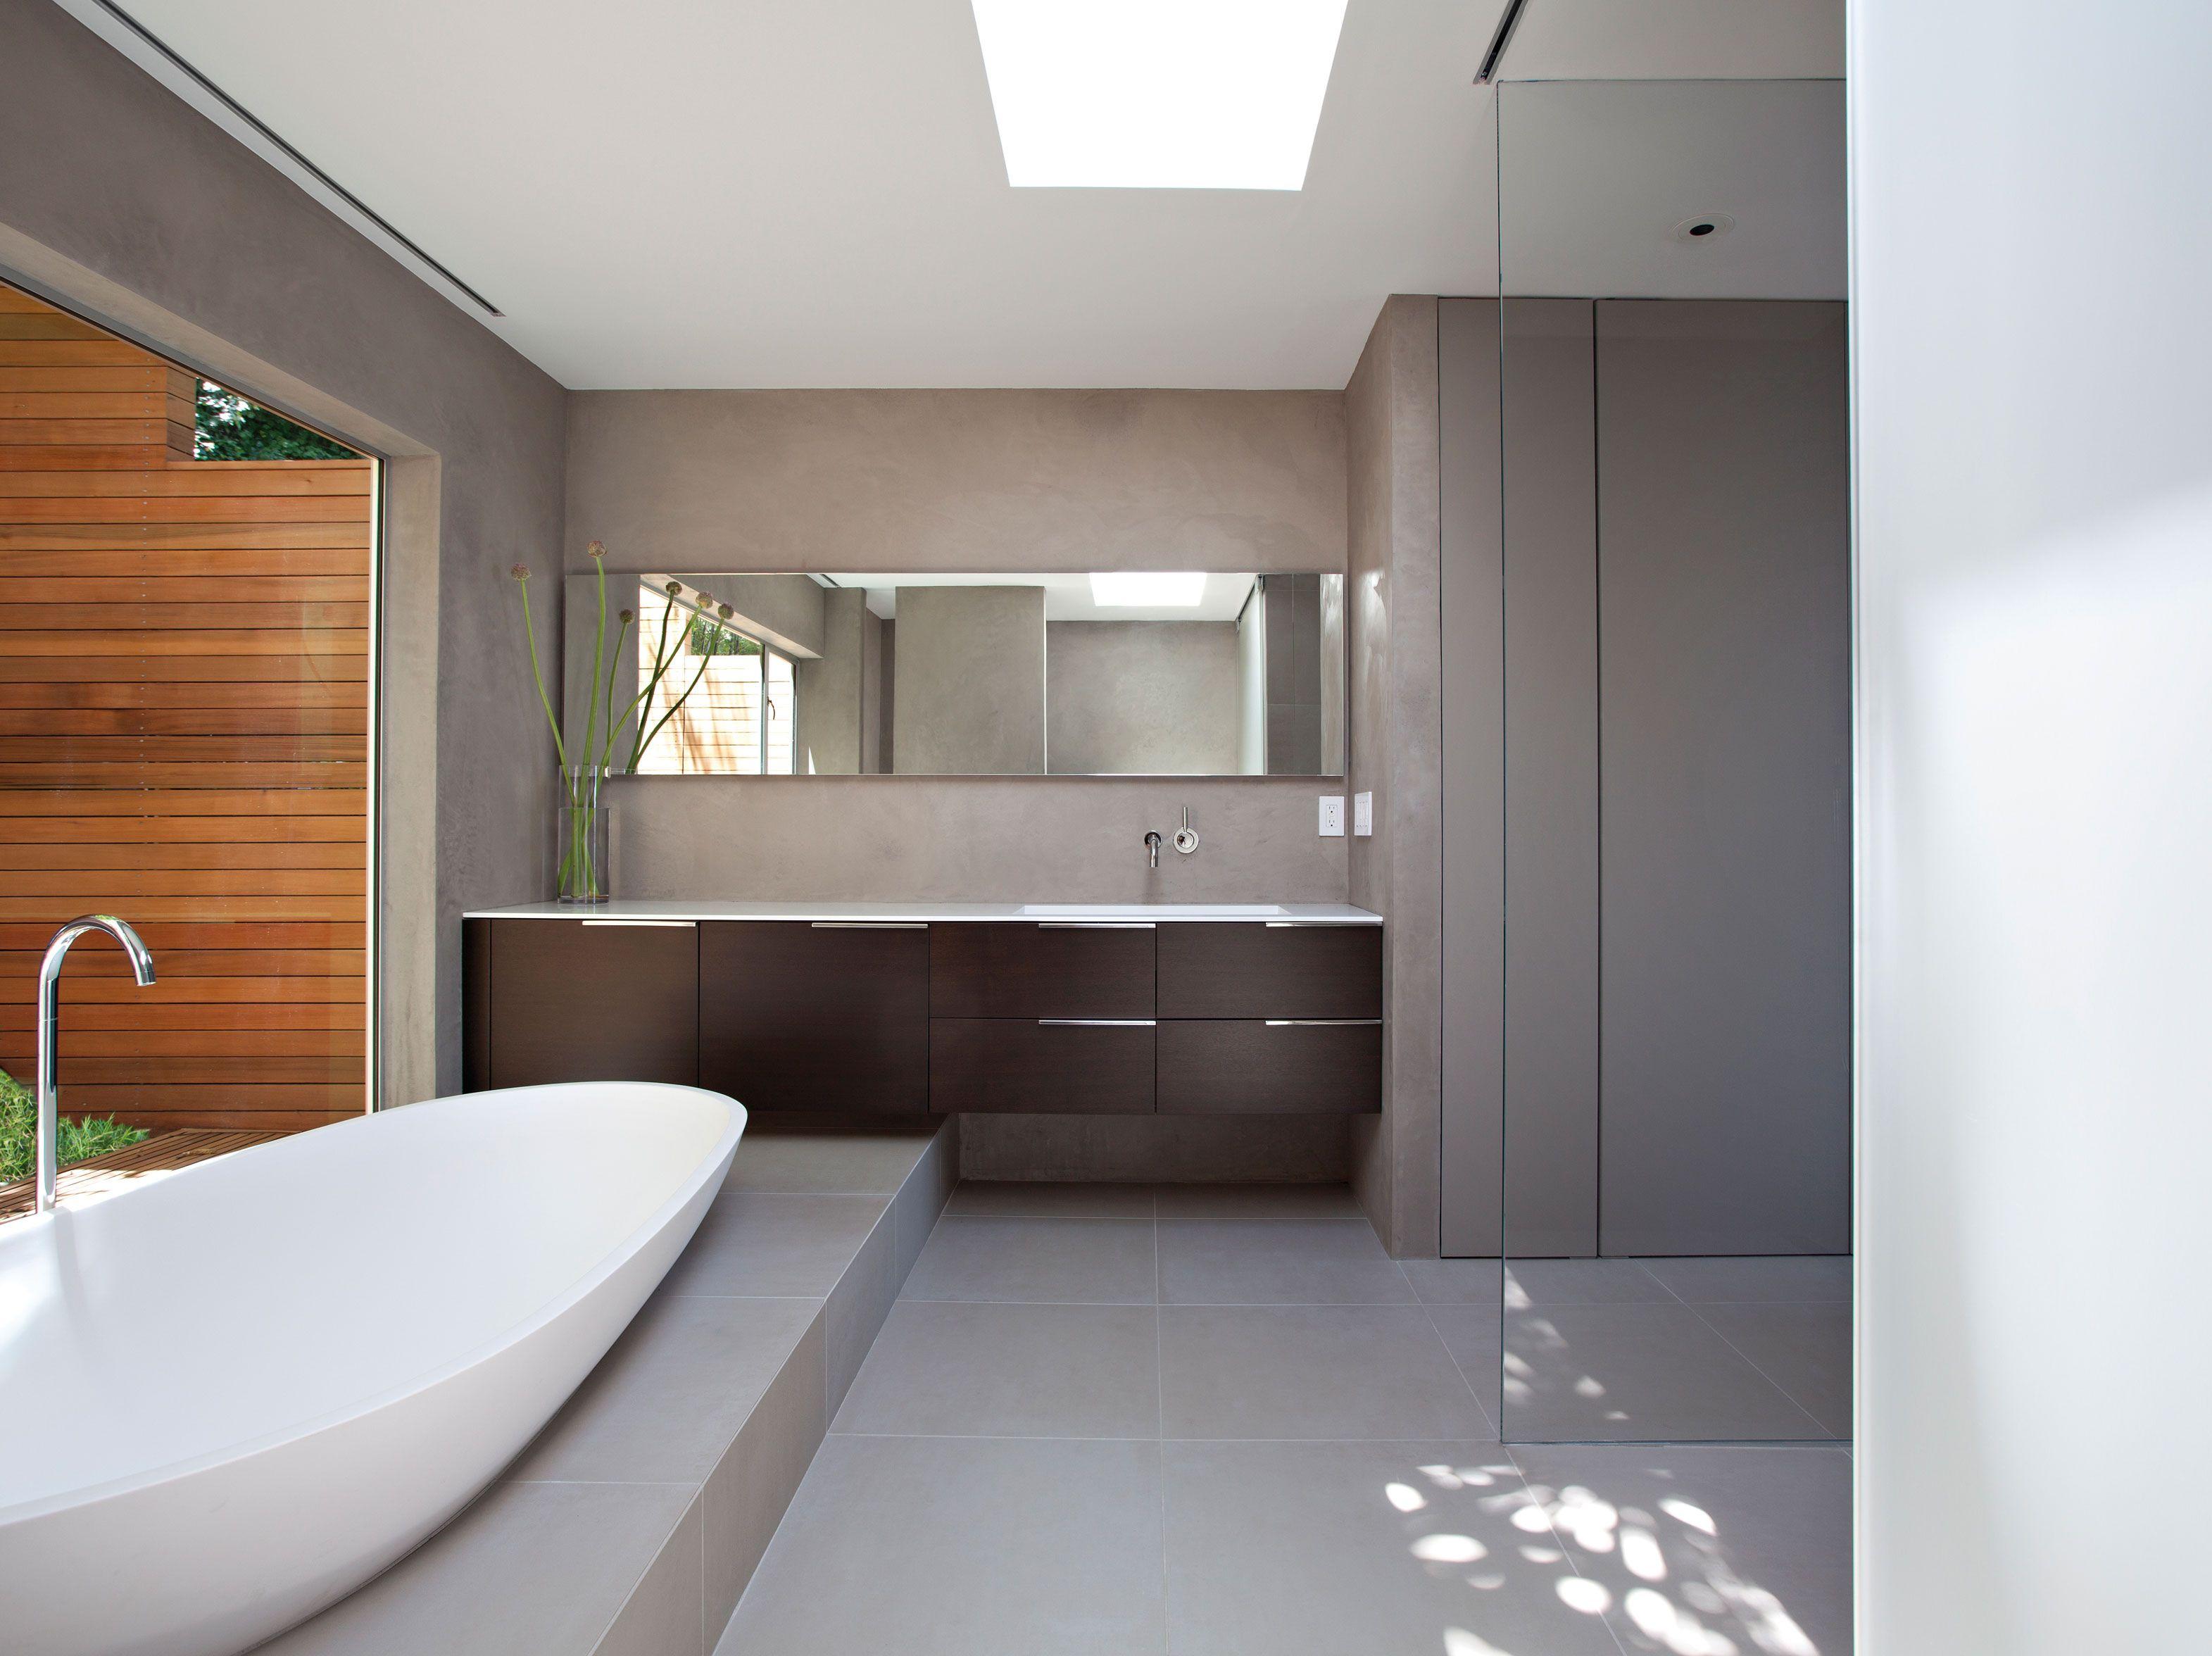 Bathroom Renovation Usa bathroom at purhaus sausalito, usa, with #beigeandbrown collection